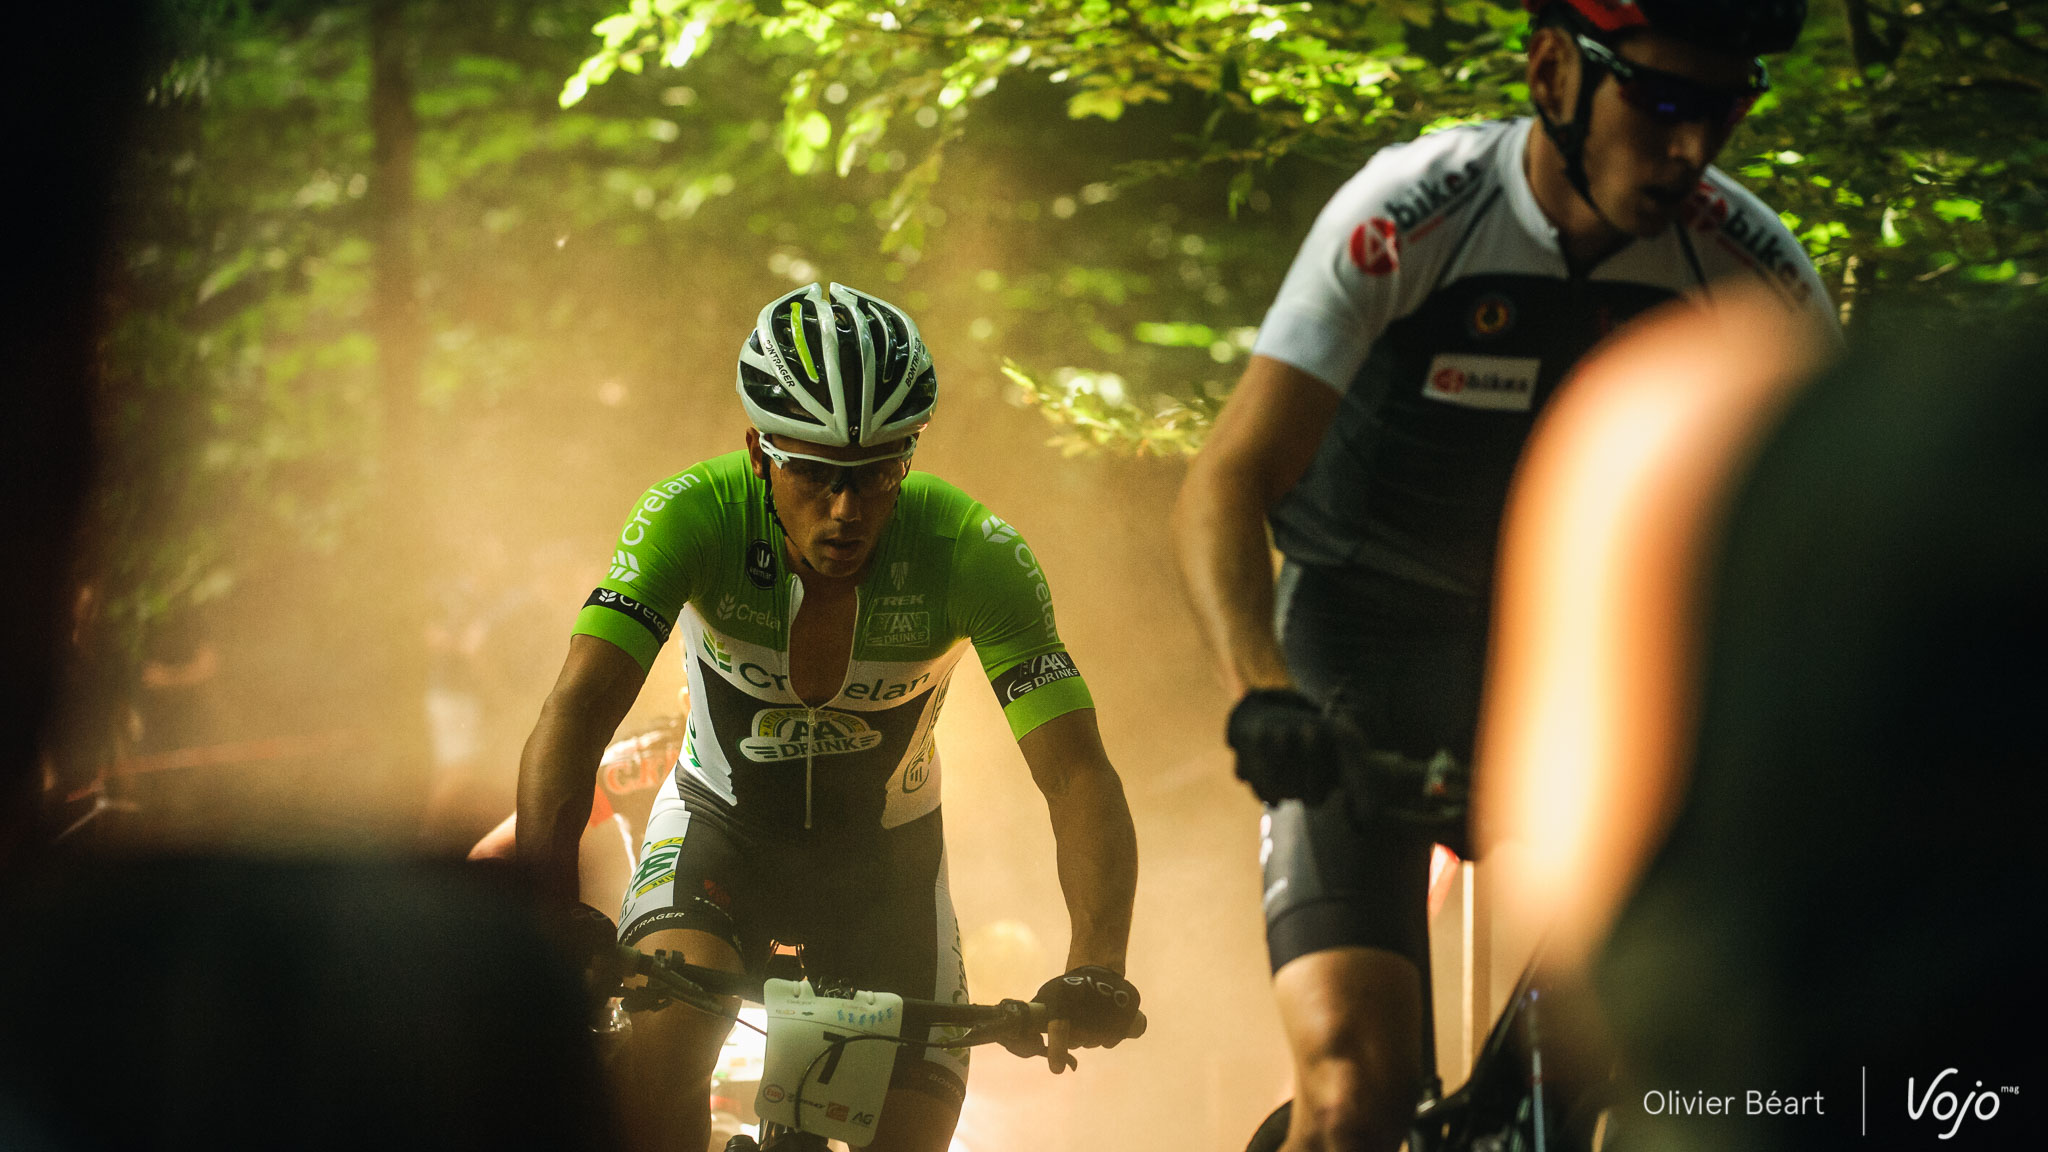 Nys_Championnat_Belgique_XC_BKXC_Ottignies_2015_Hommes_Copyright_OBeart_VojoMag-1-4